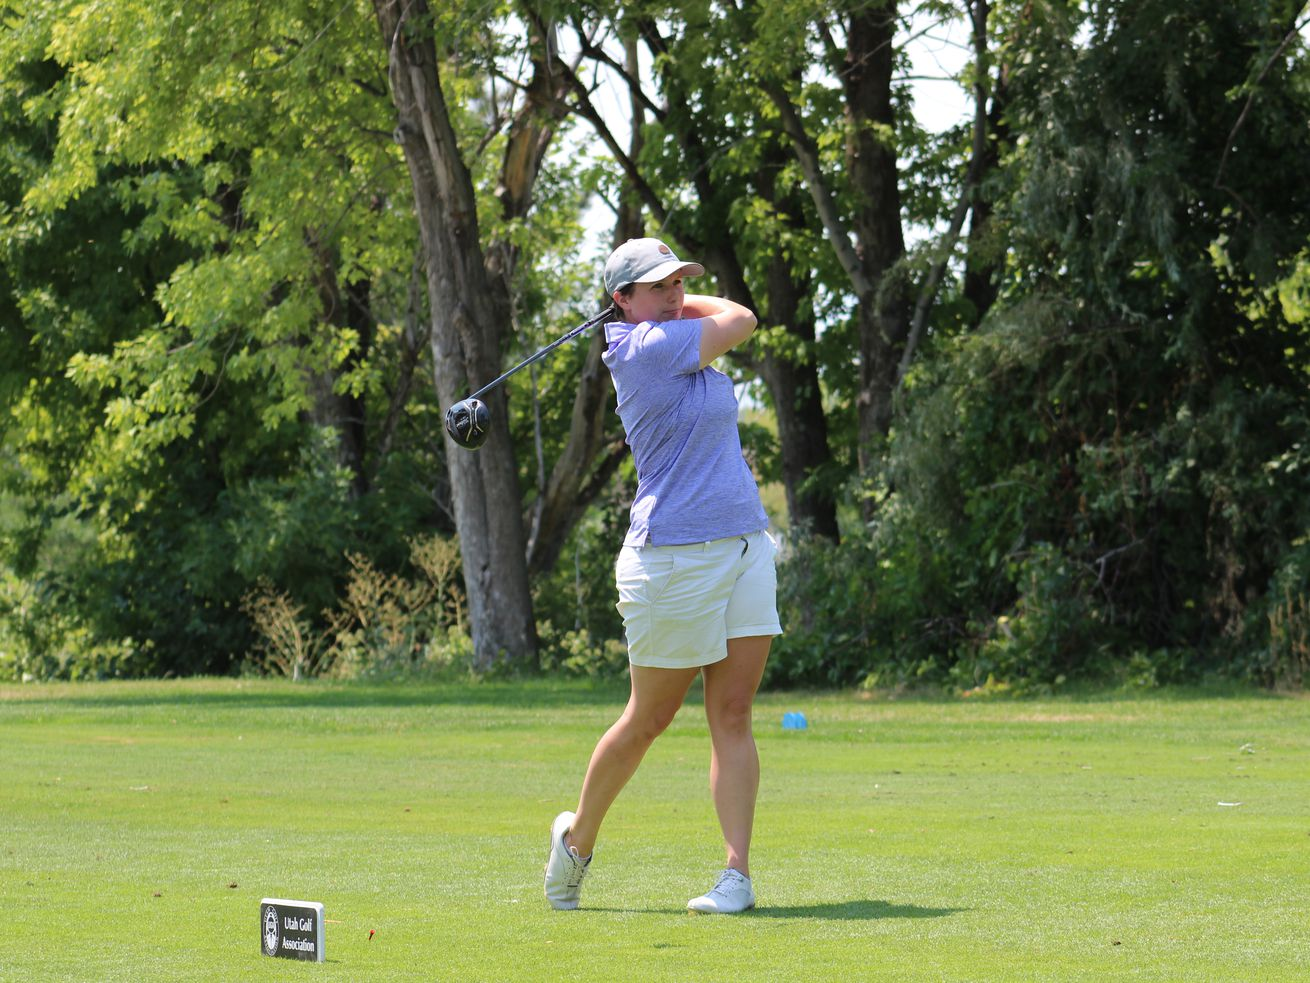 Salt Lake's Chugg advances in Mid-Amateur golf